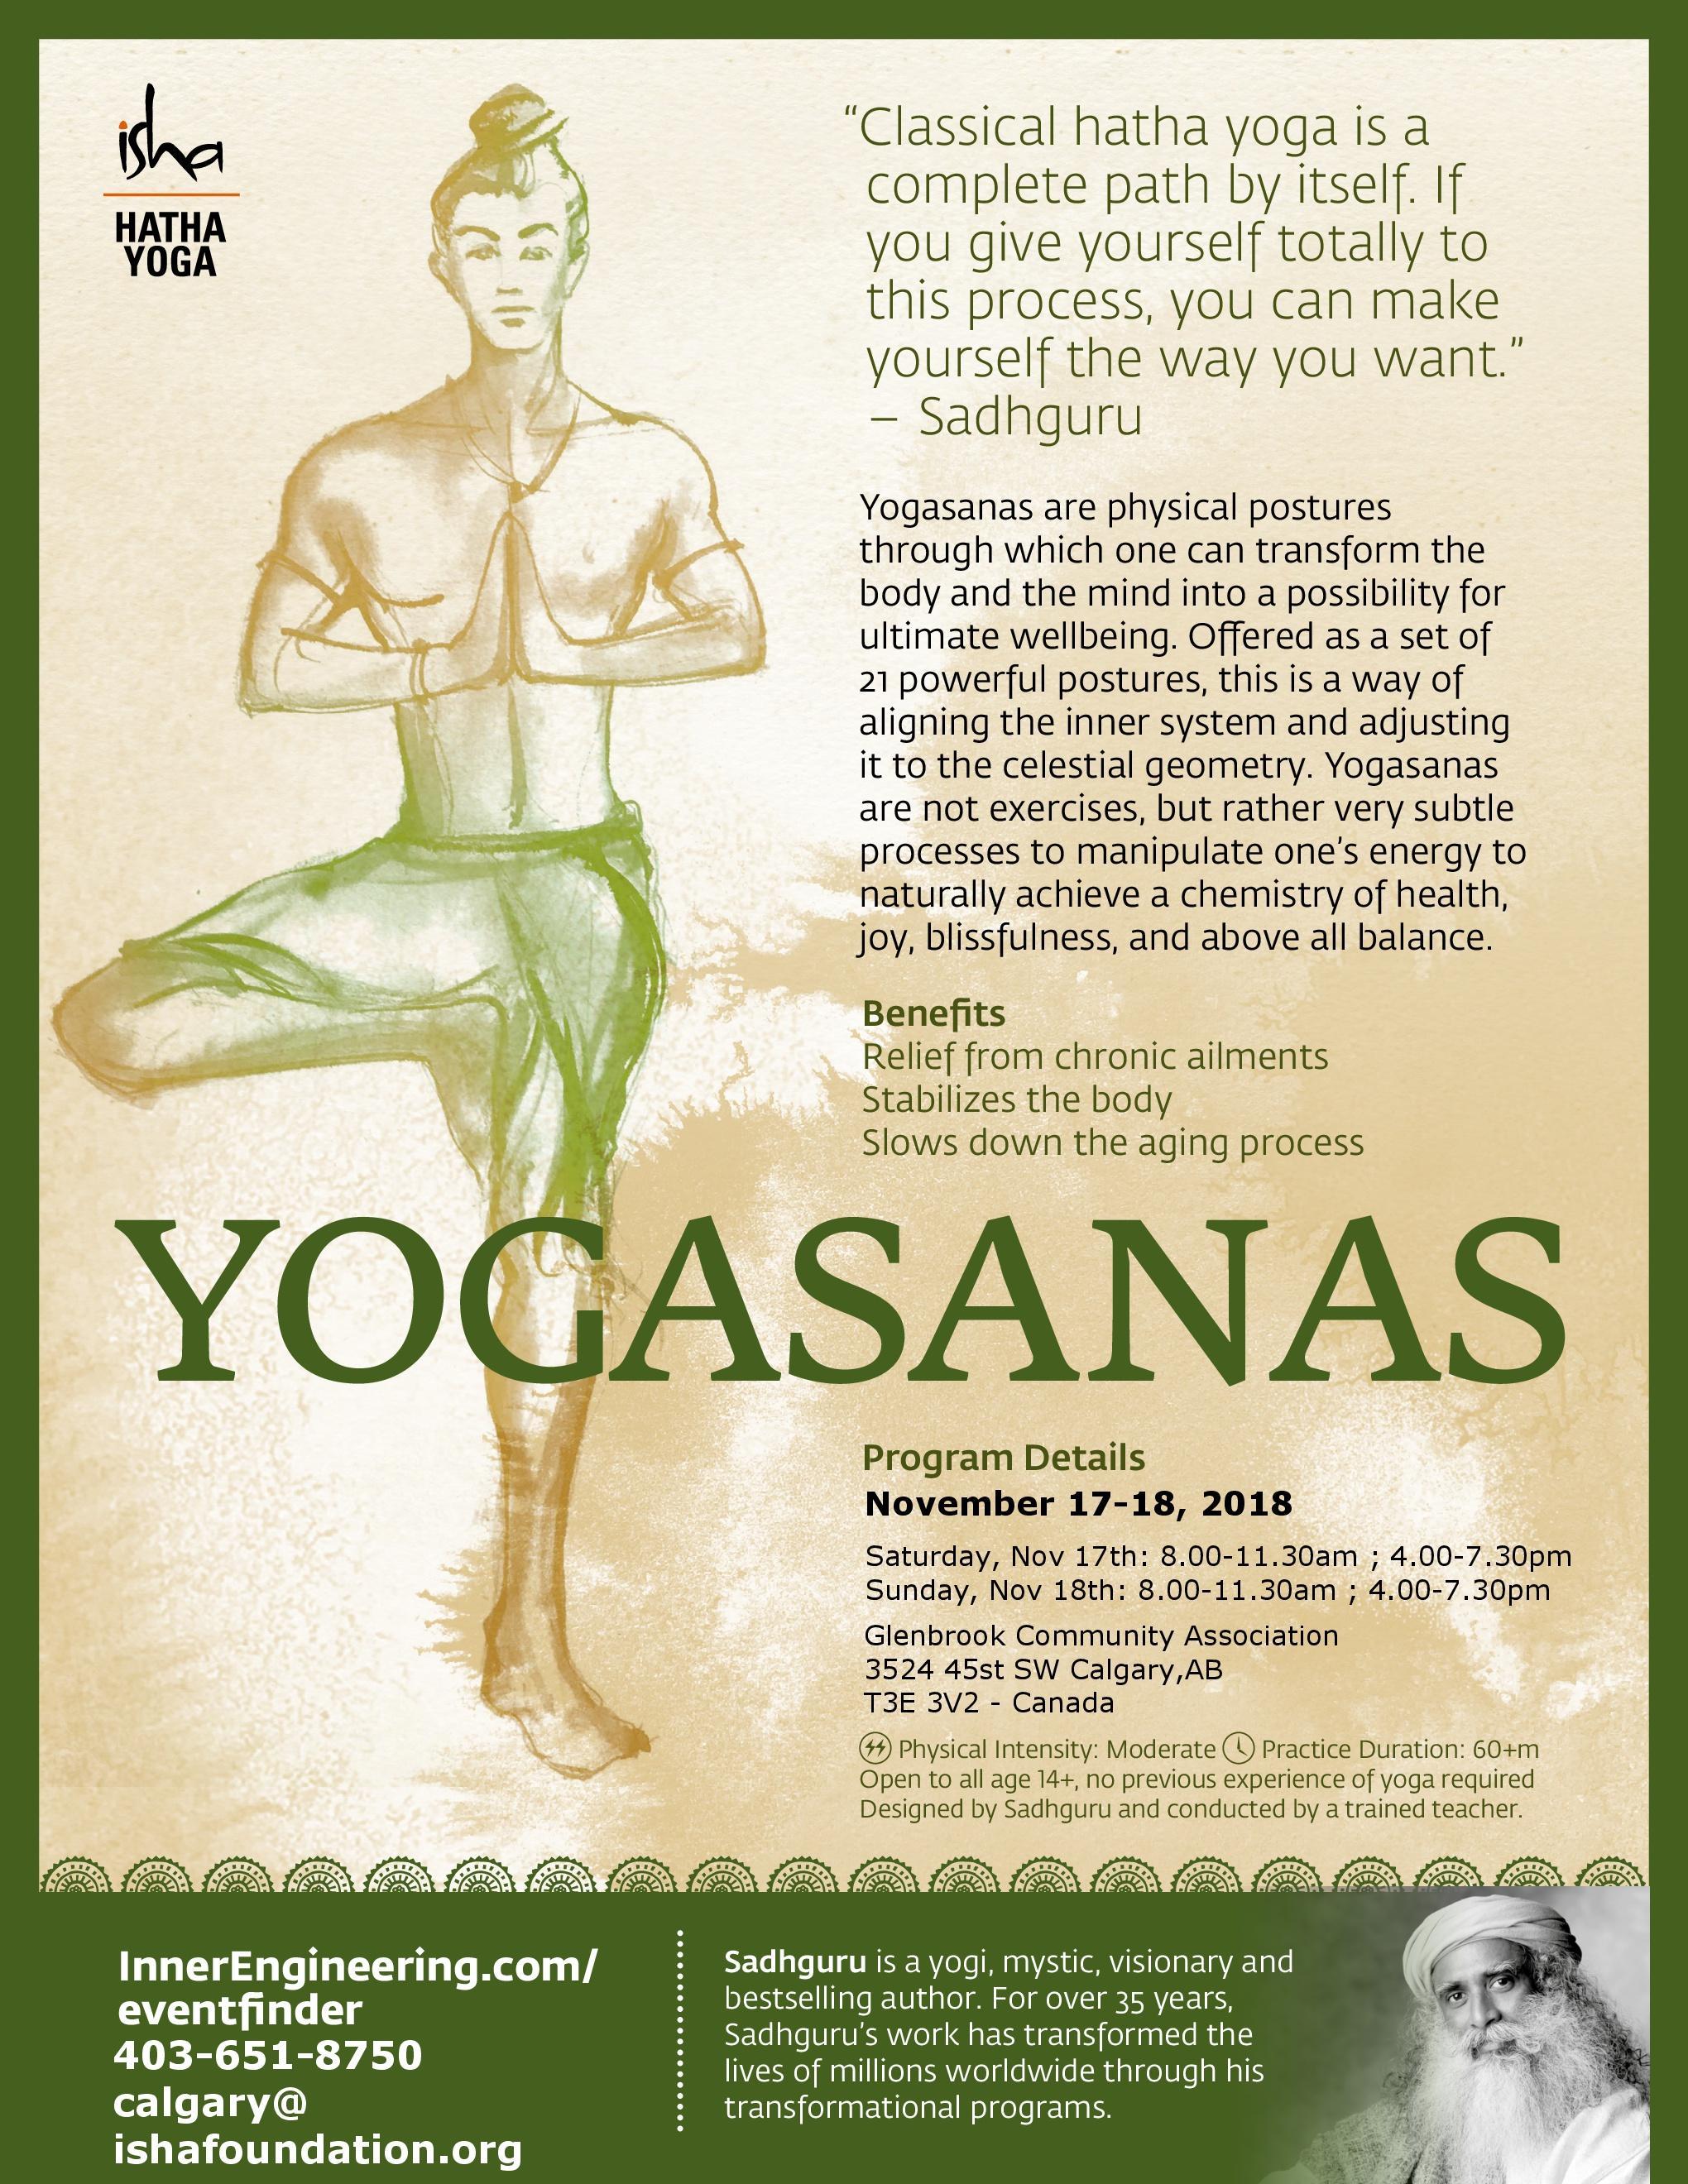 Yoga poster for Isha Yogasanas workshop in Calgary November 17-18, 2018